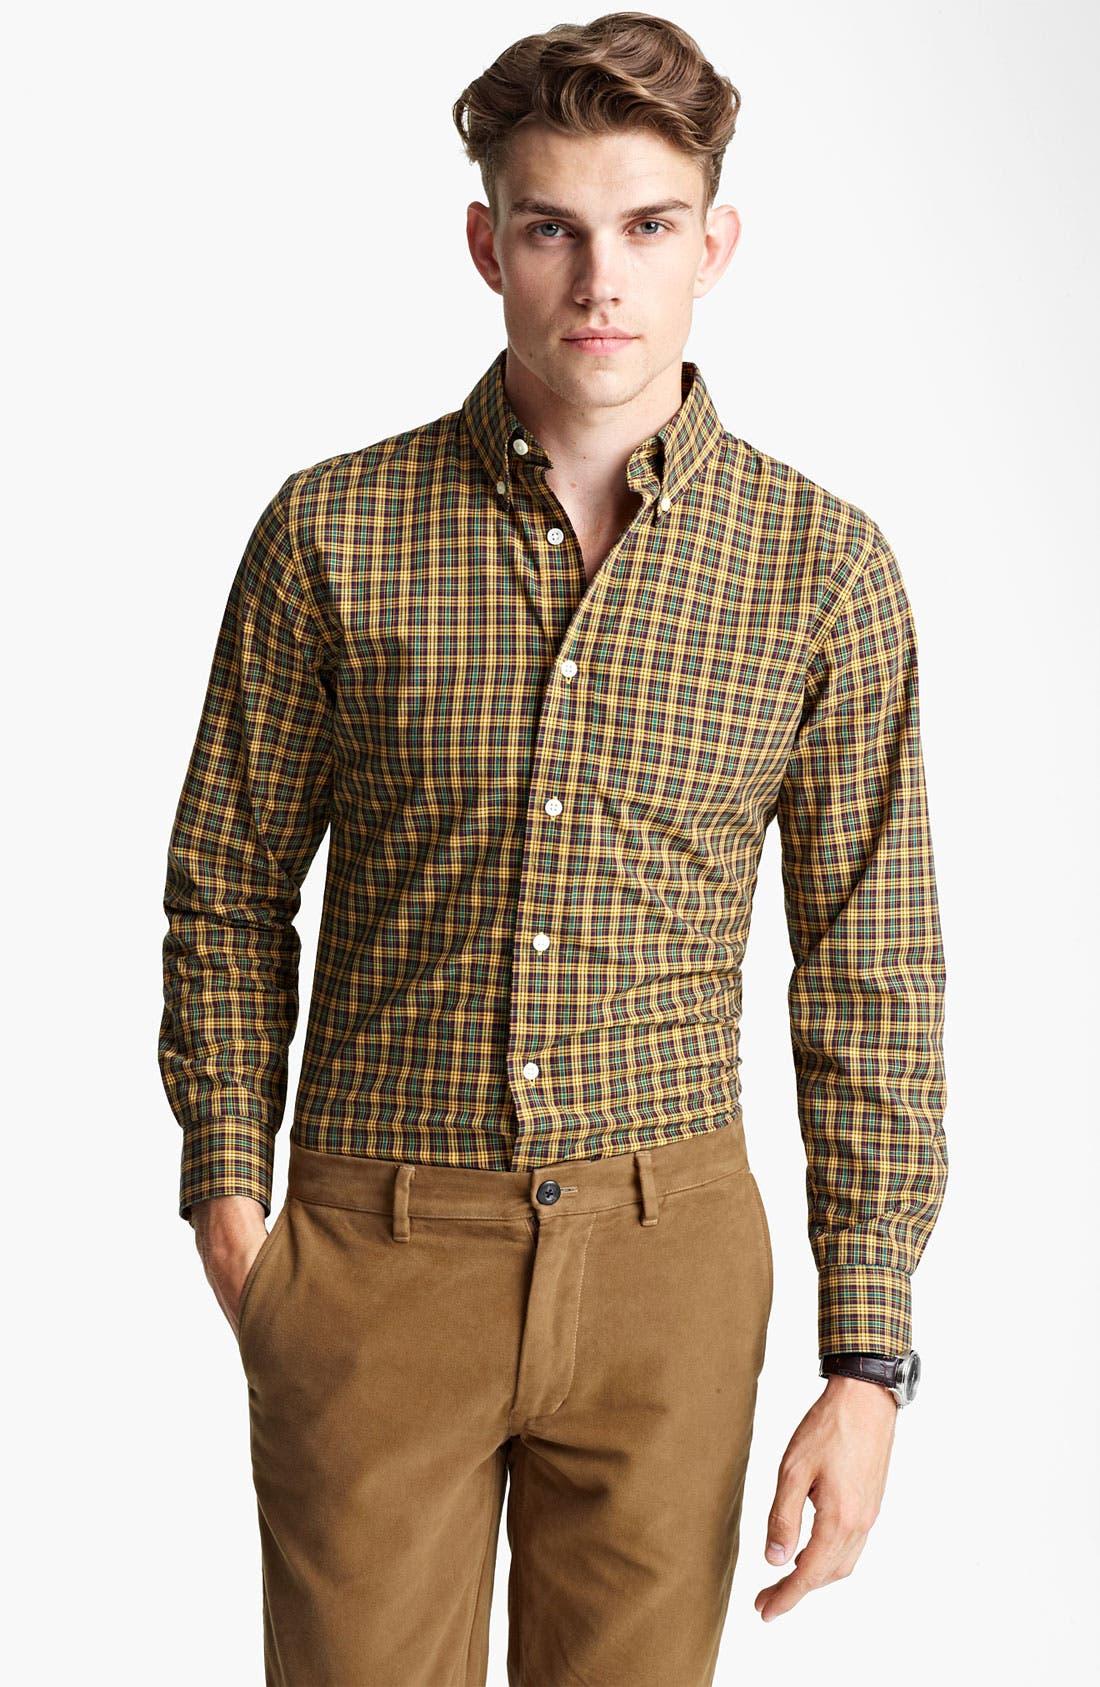 Alternate Image 1 Selected - Jack Spade 'Nolen' Check Woven Shirt